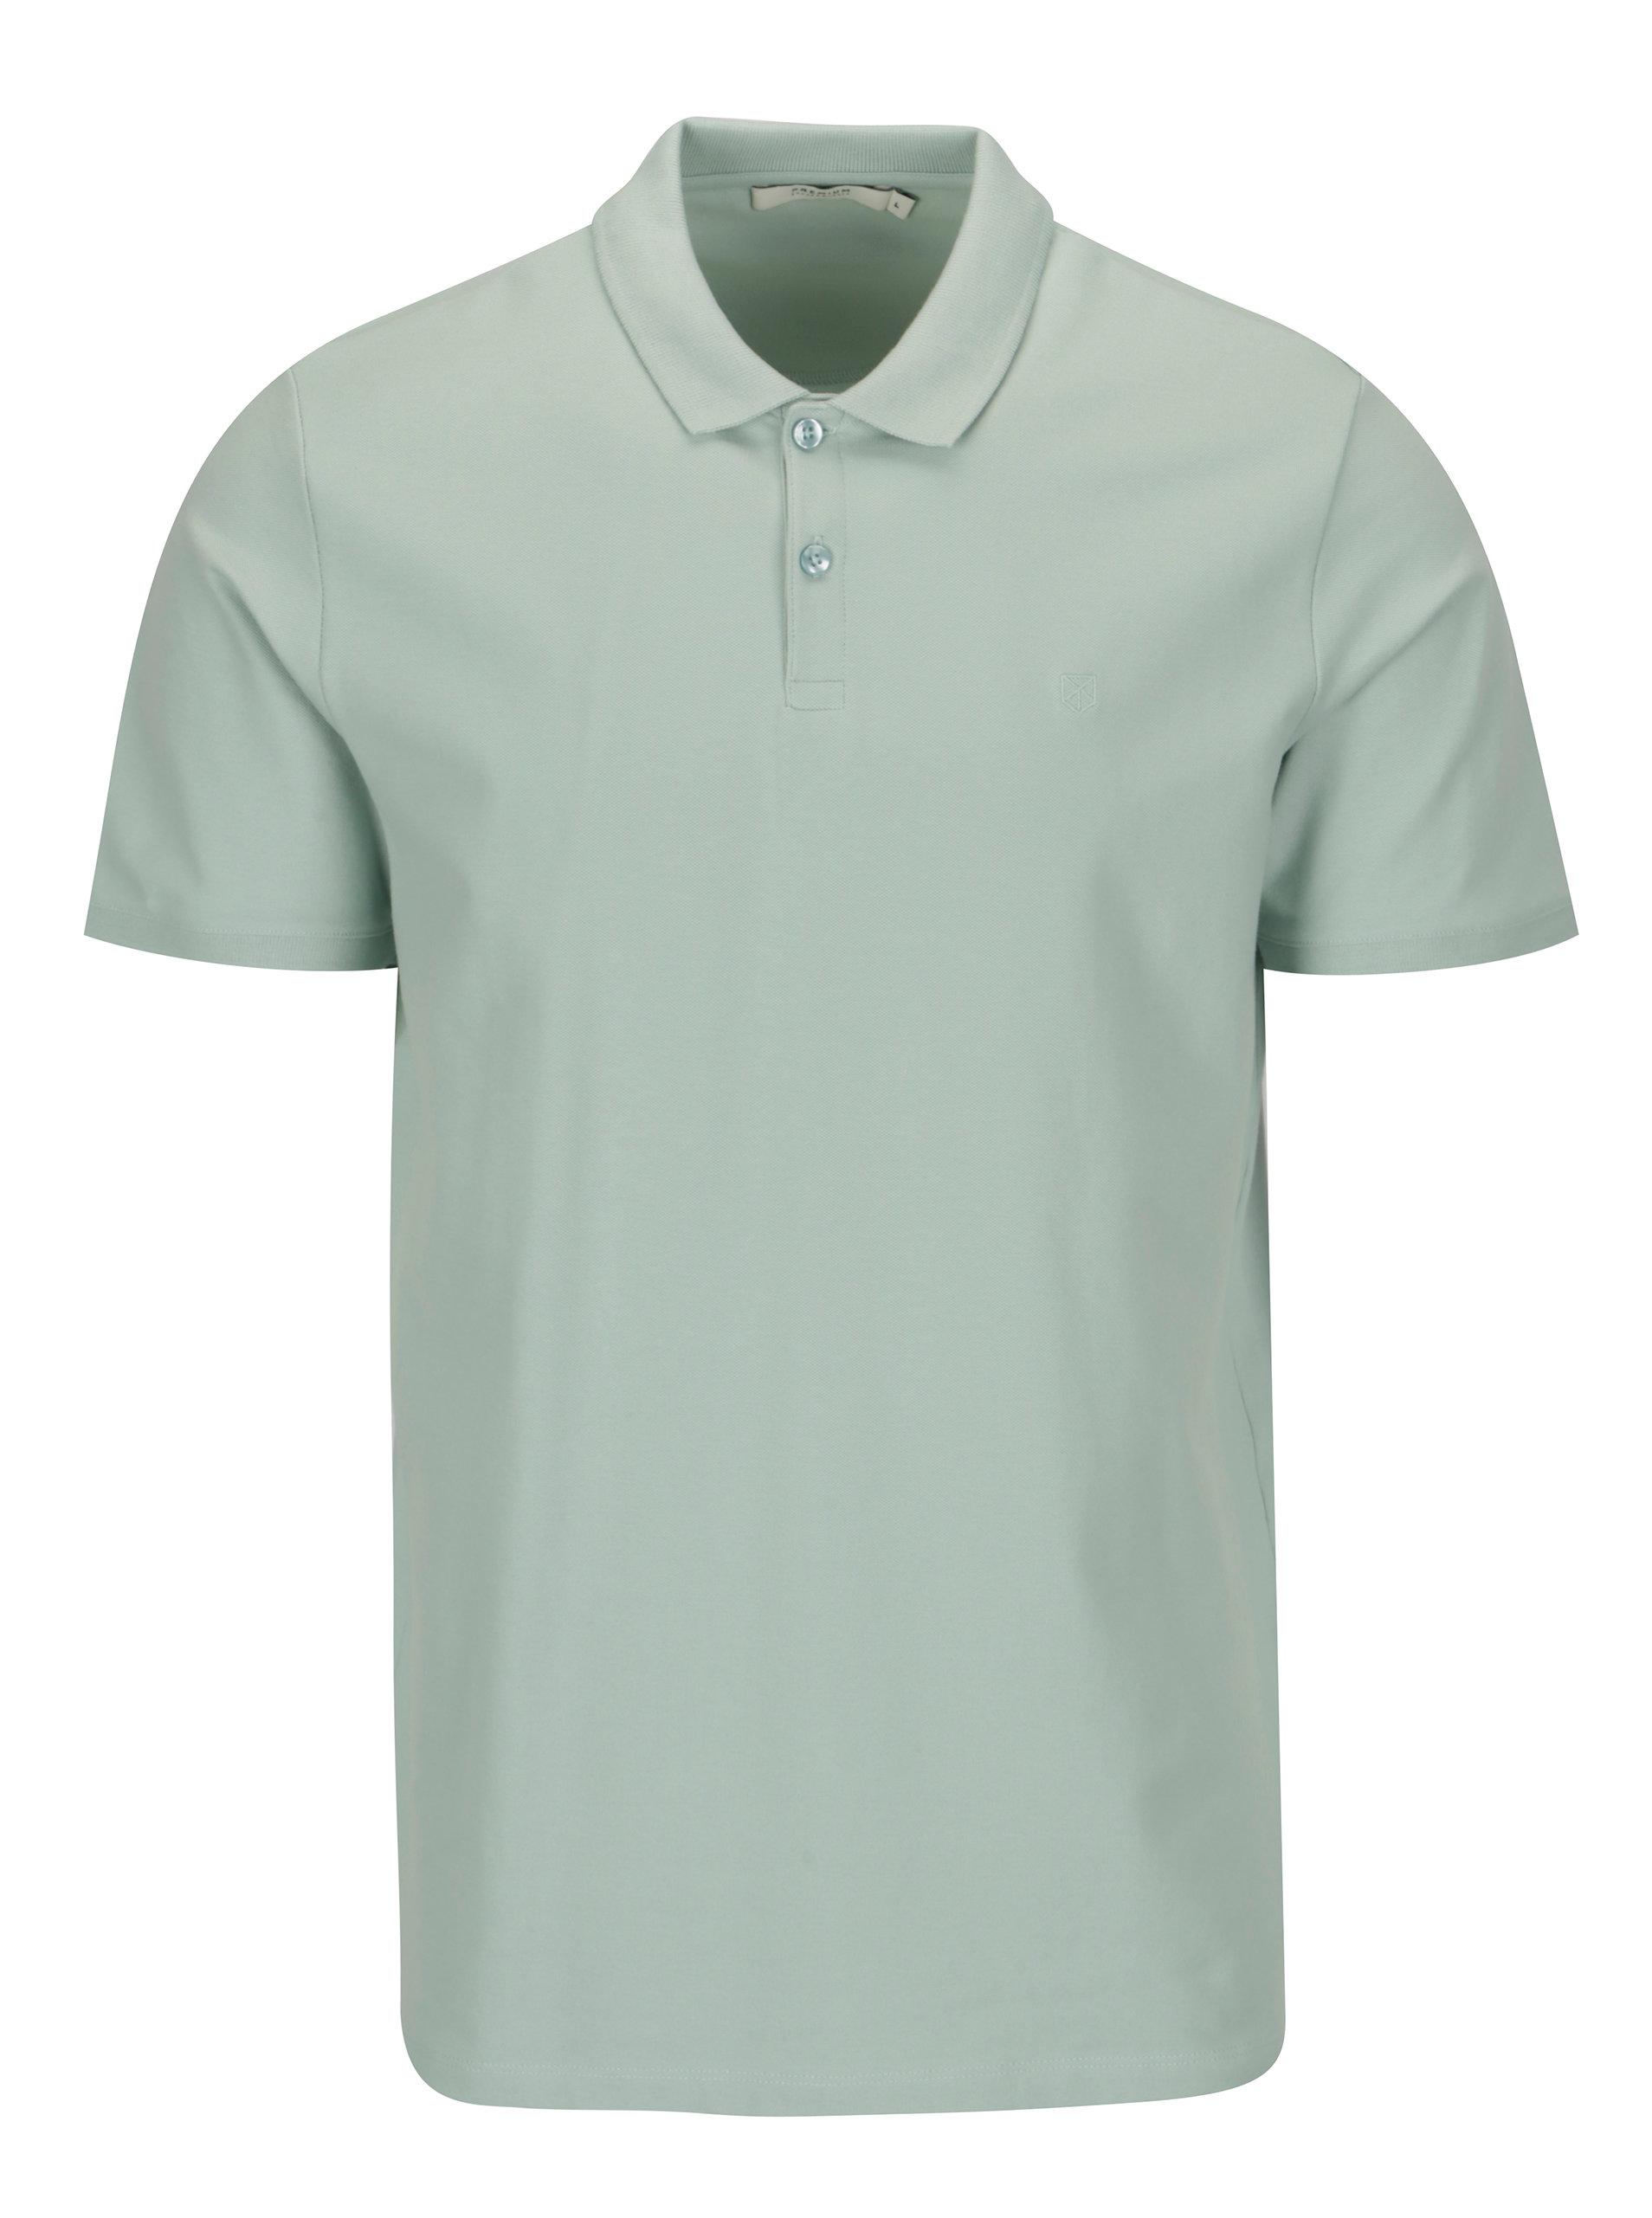 Světle zelené polo tričko Jack   Jones Premium Belfast ... 4eaa713ff1